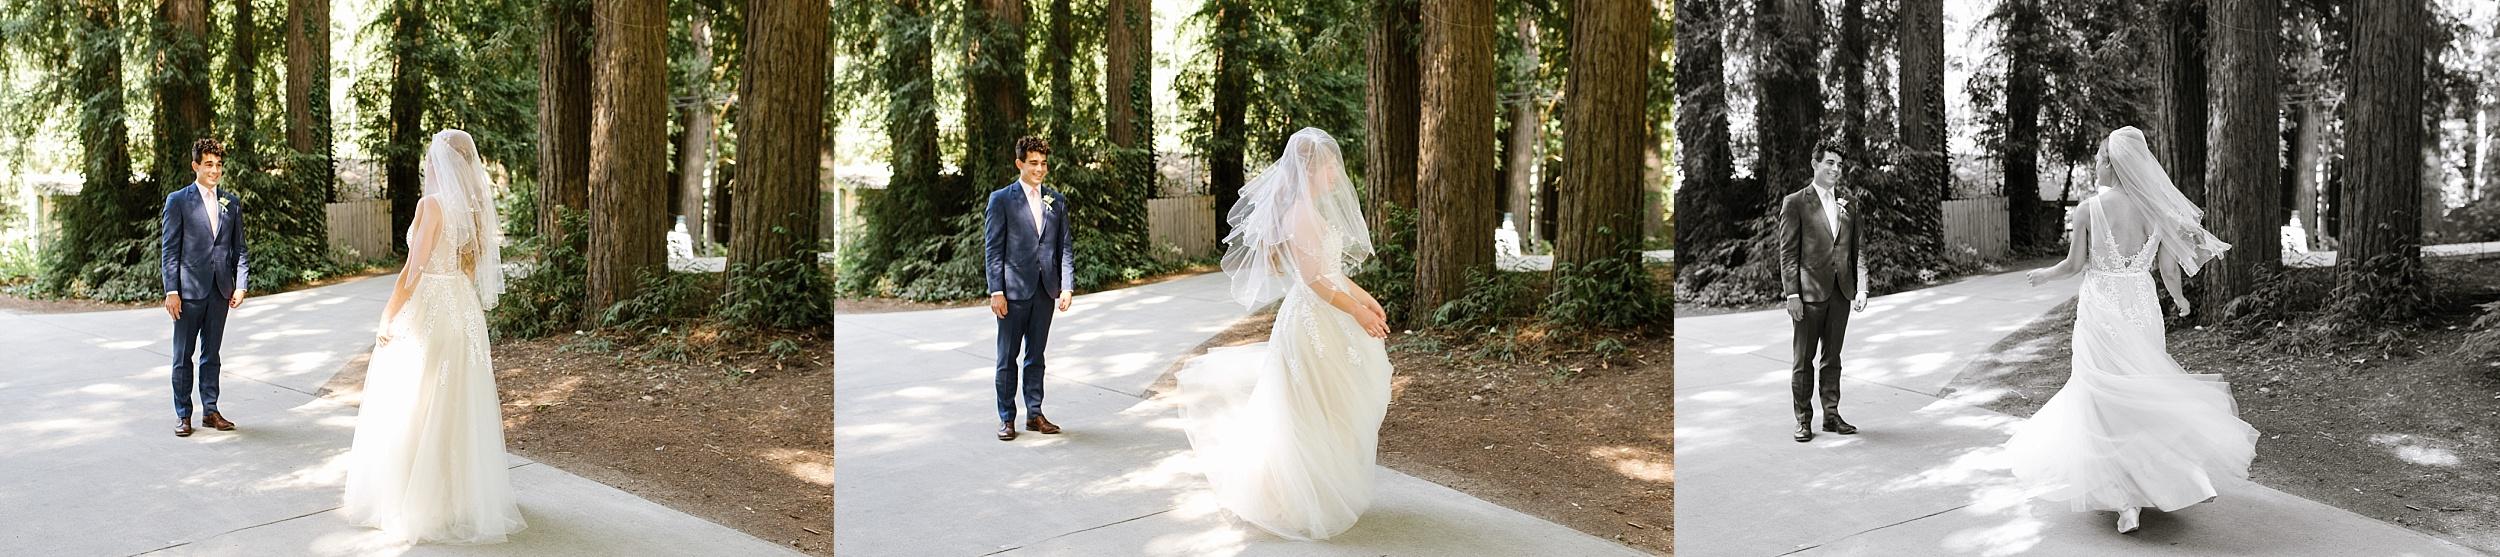 Amphitheatre-of-the-Redwoods-wedding-erikariley_chelsea-dier-photography_0007.jpg